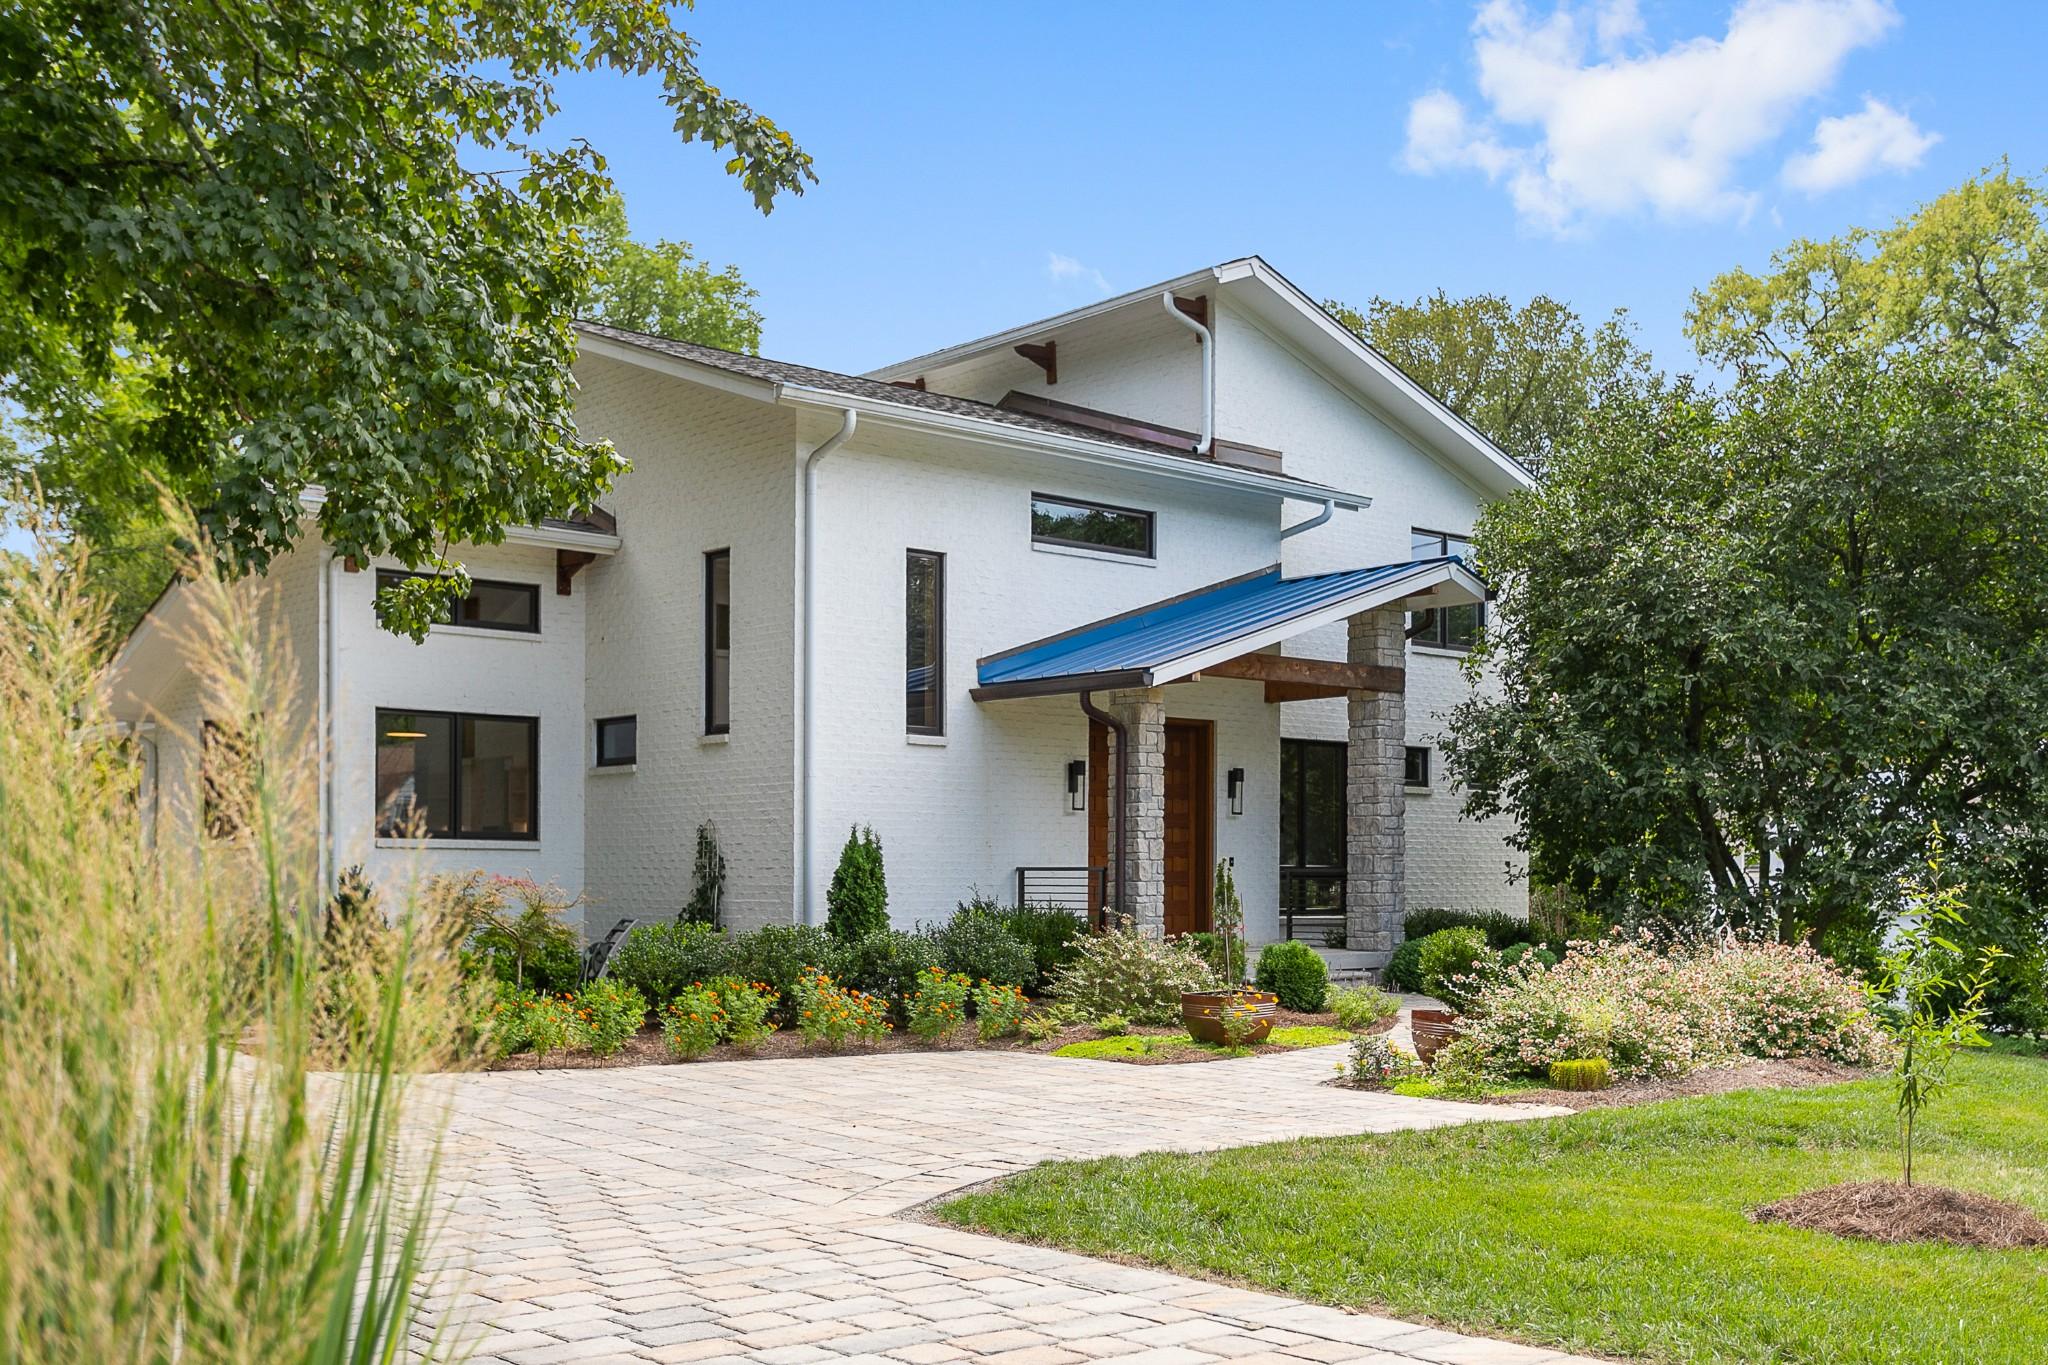 2907 Woodlawn Property Photo